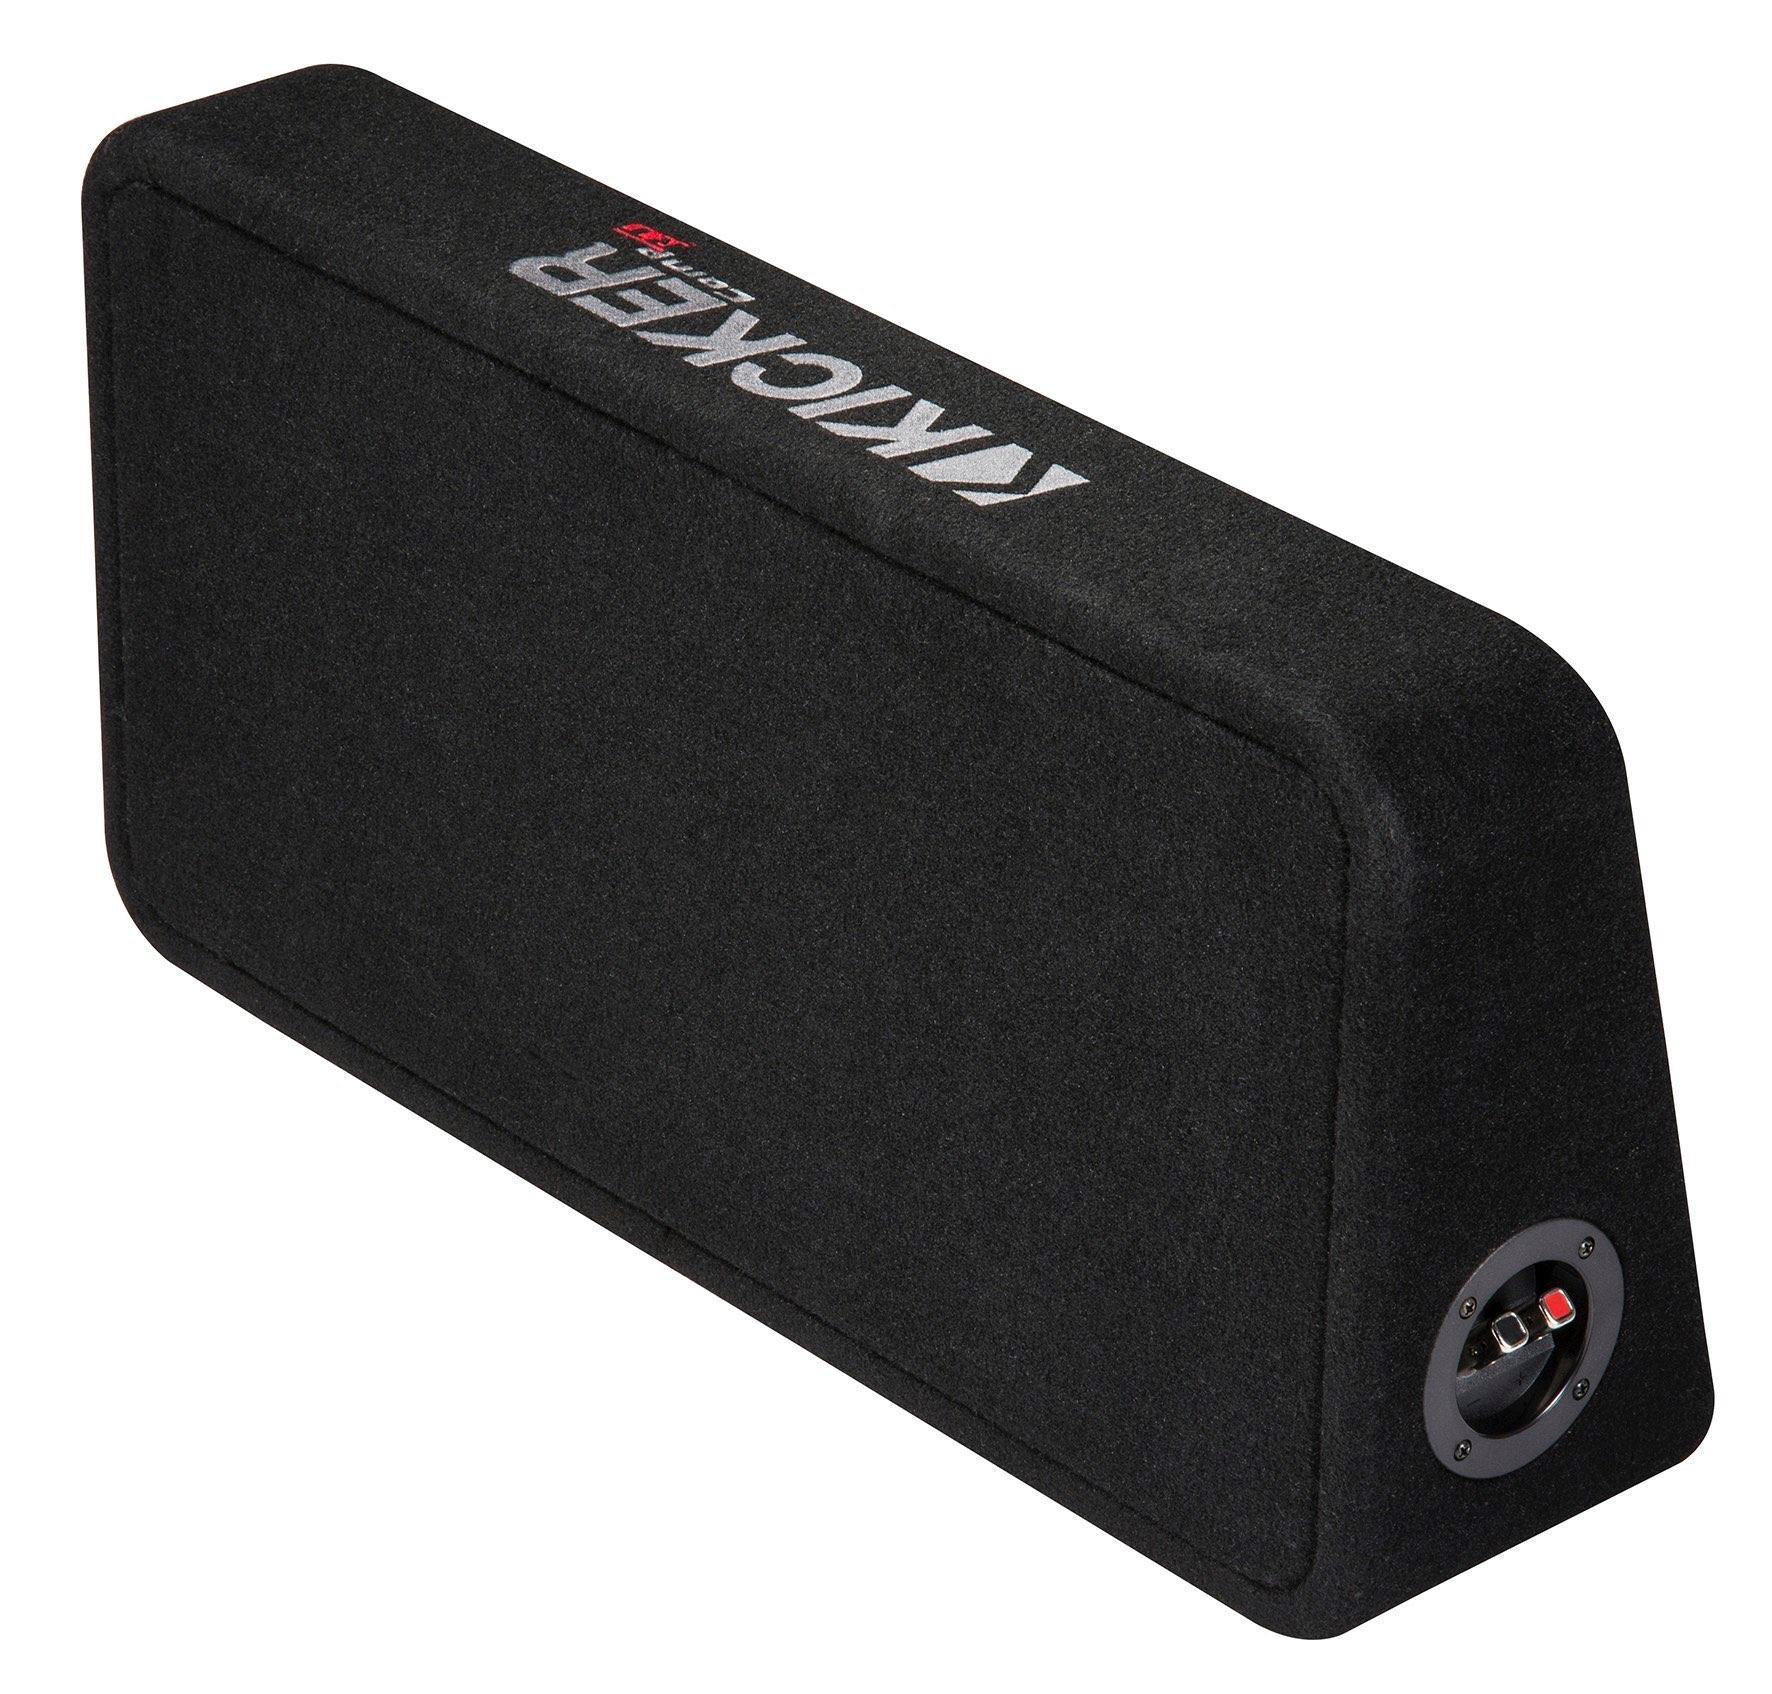 kicker subwoofer tcomp rt102 kleine bassbox 800w 2ohm. Black Bedroom Furniture Sets. Home Design Ideas